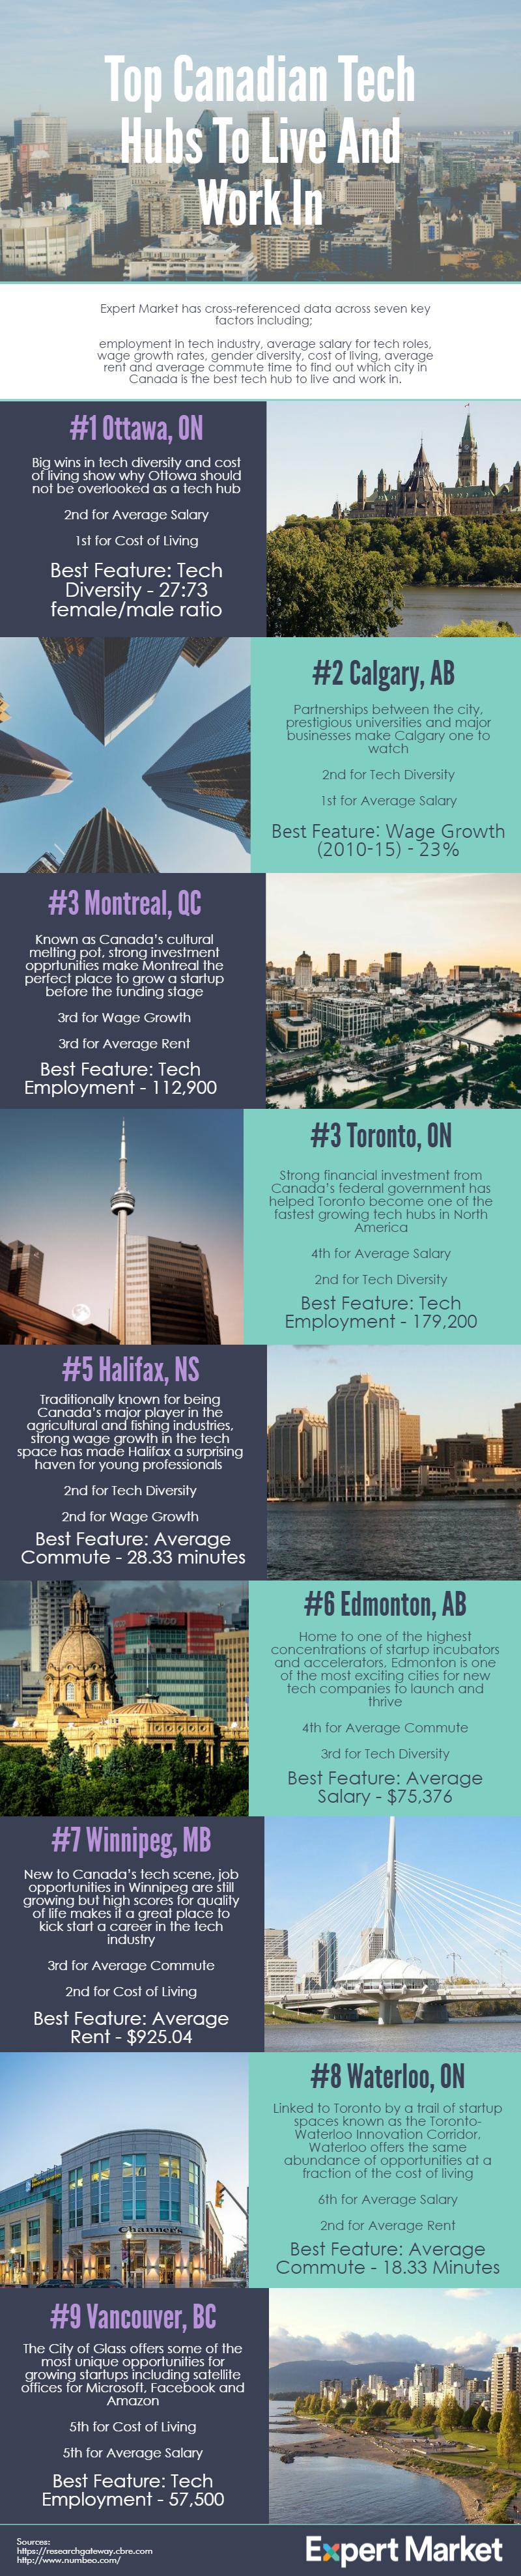 Canadas-top-tech-hubs-infographic